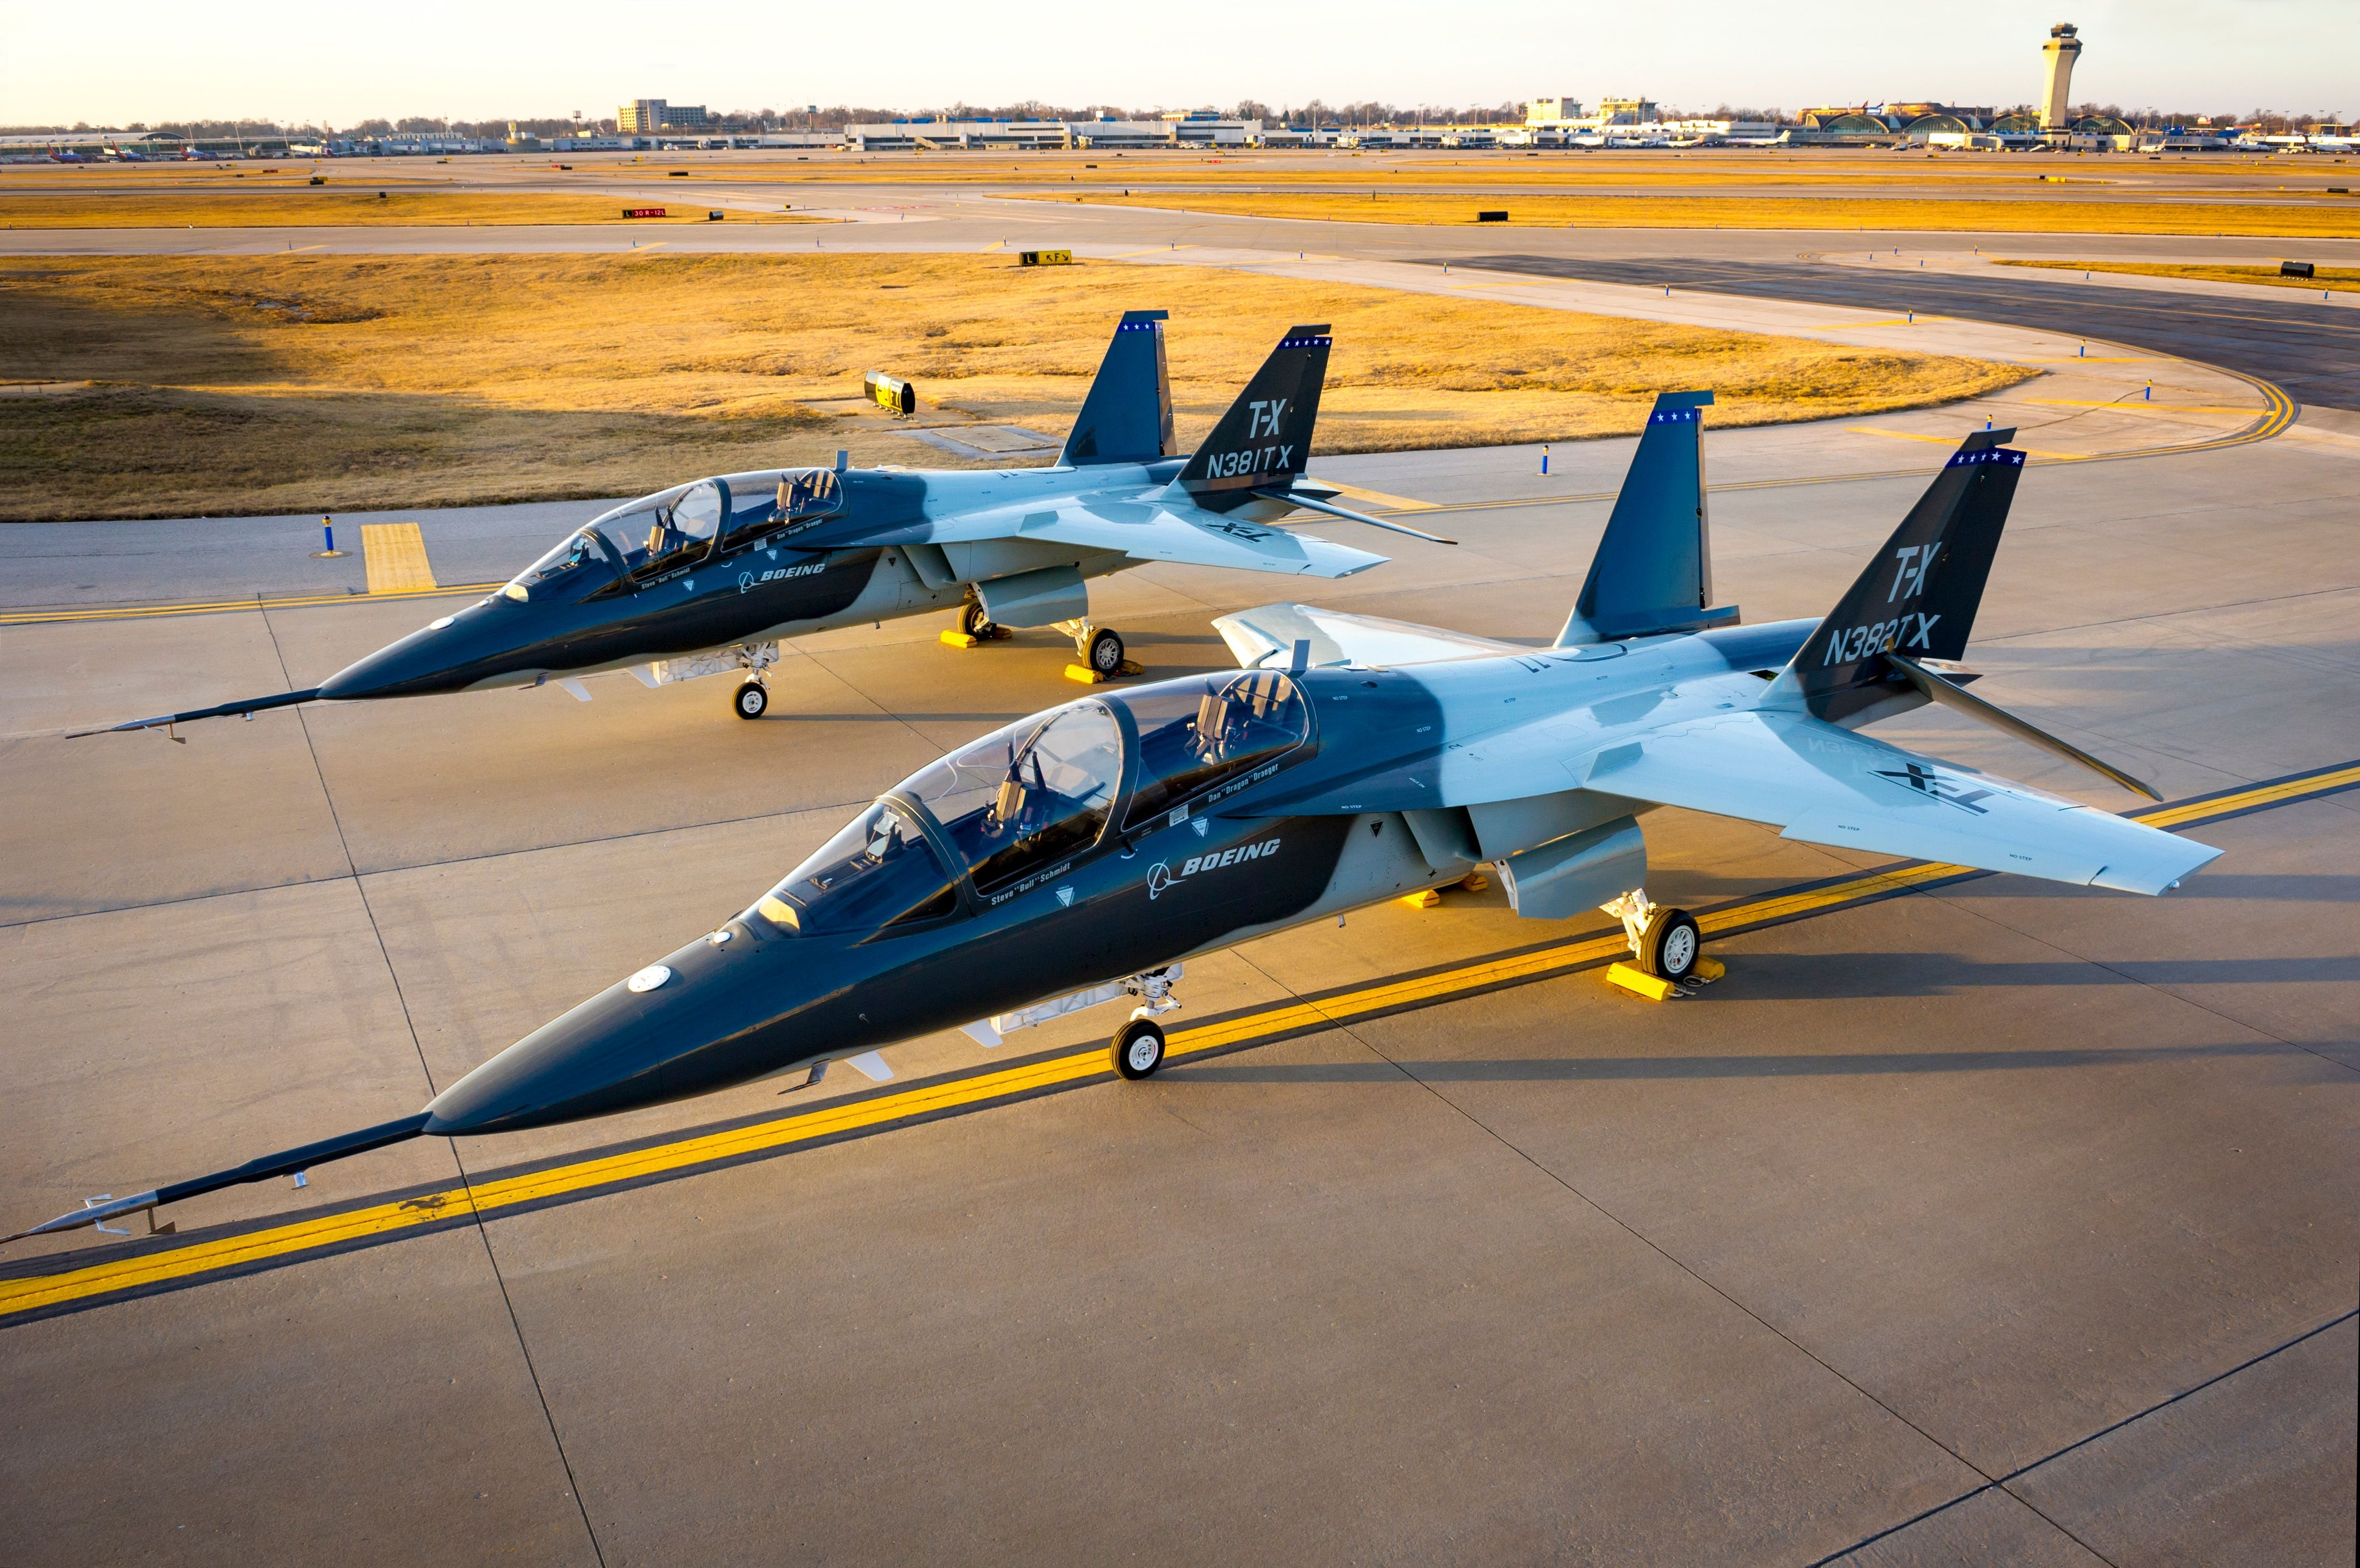 Pin by Ismu Mahardika on aircraft   Aircraft, Fighter jets